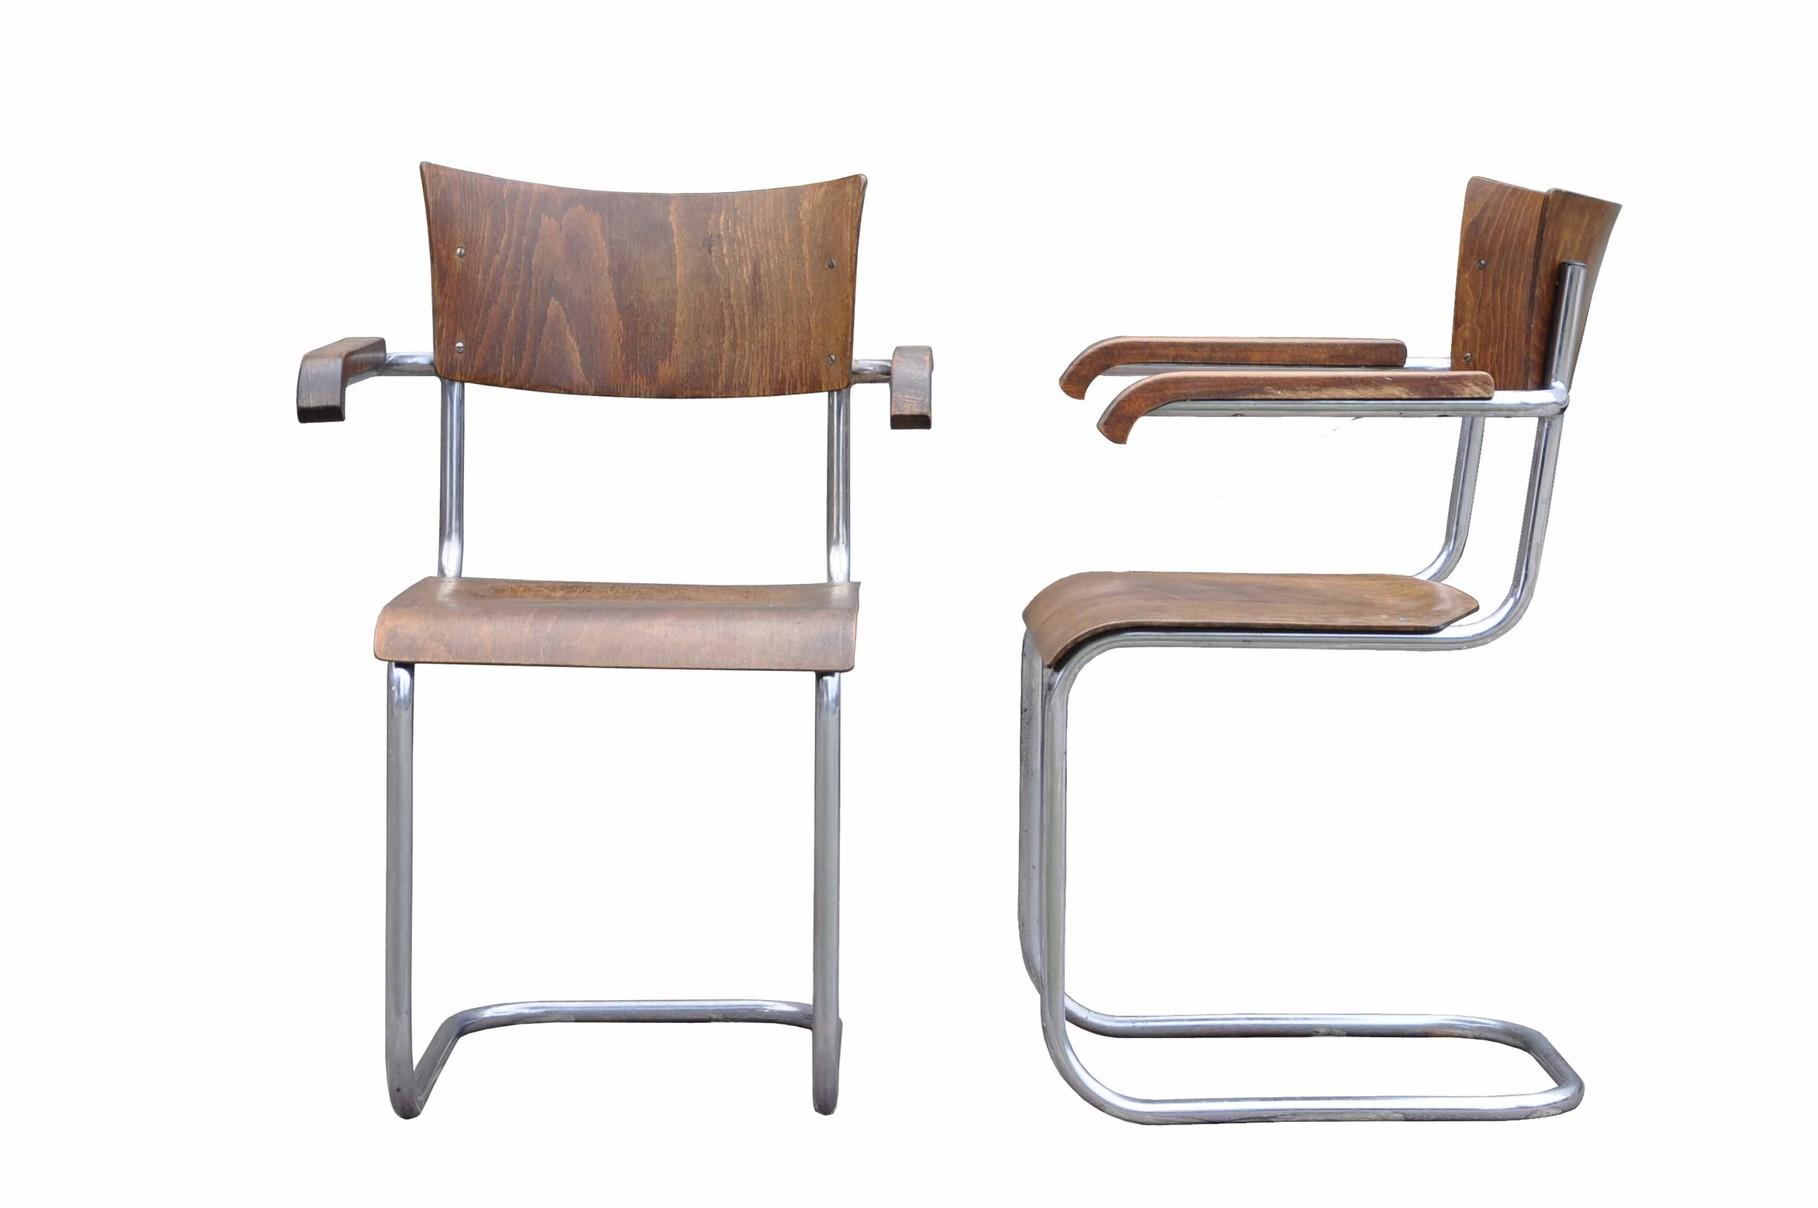 sedia cantilever bauhaus mart stam thonet b43f italian vintage sofa. Black Bedroom Furniture Sets. Home Design Ideas